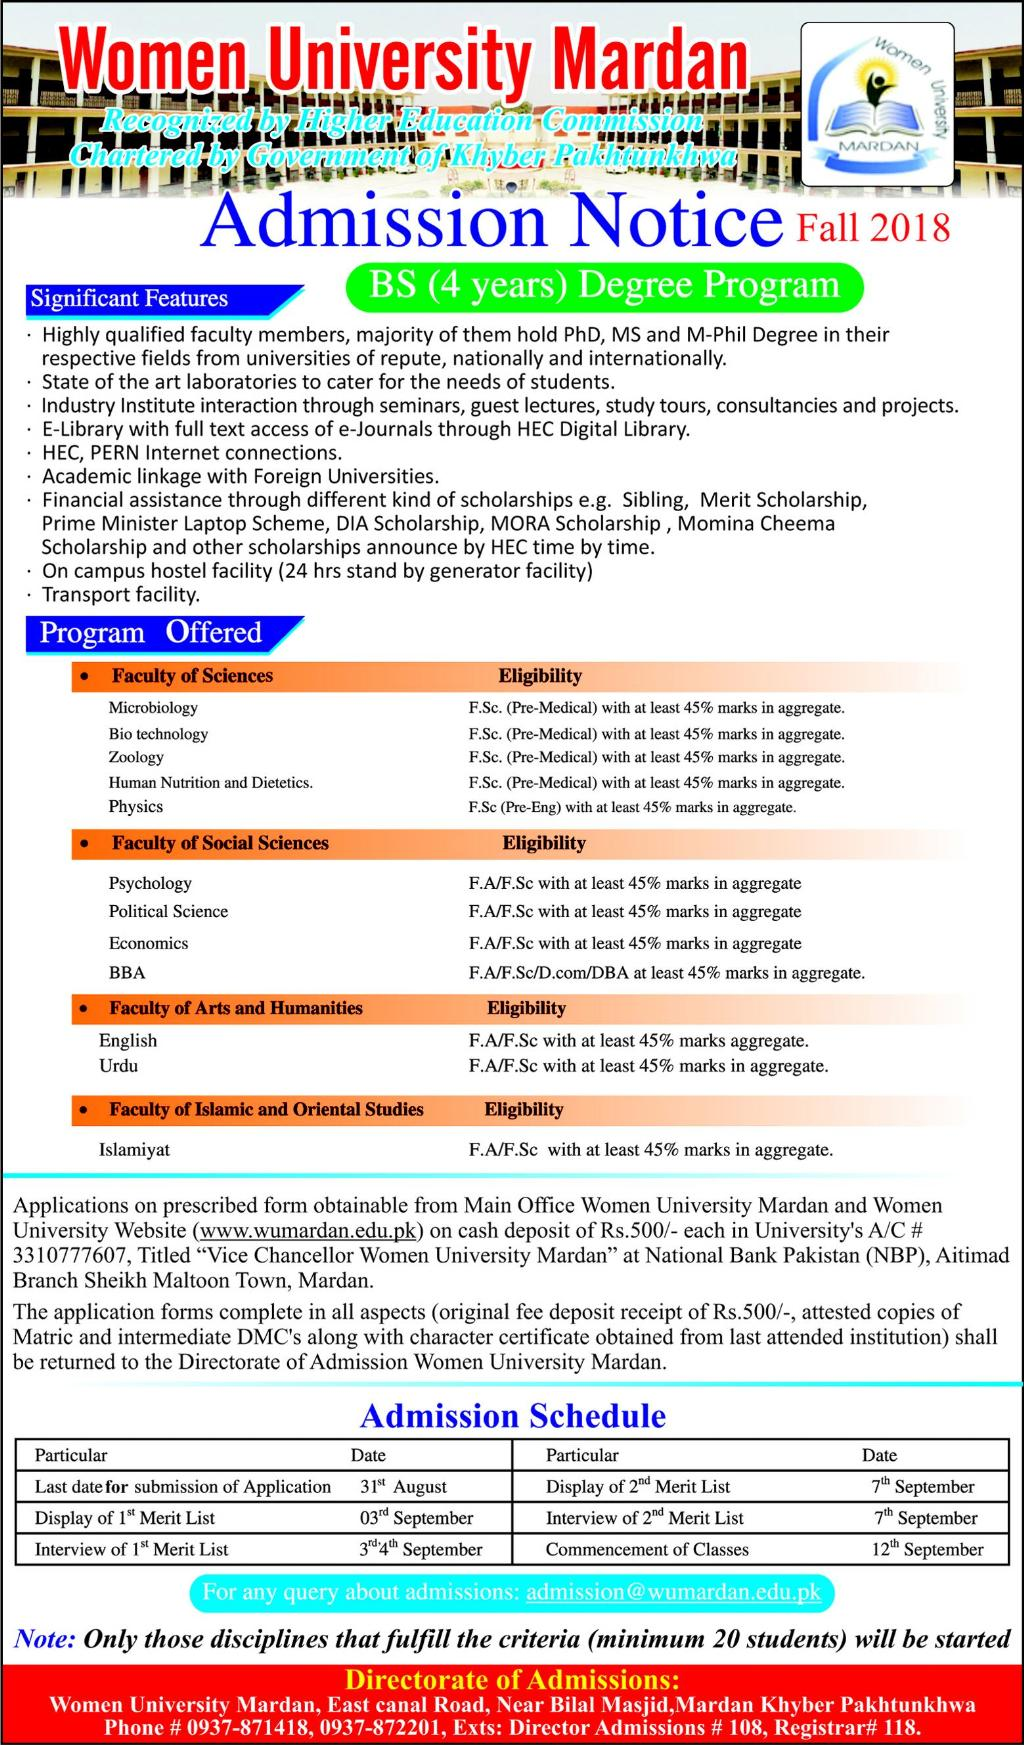 Women University Mardan Admission 2018 Form Merit List